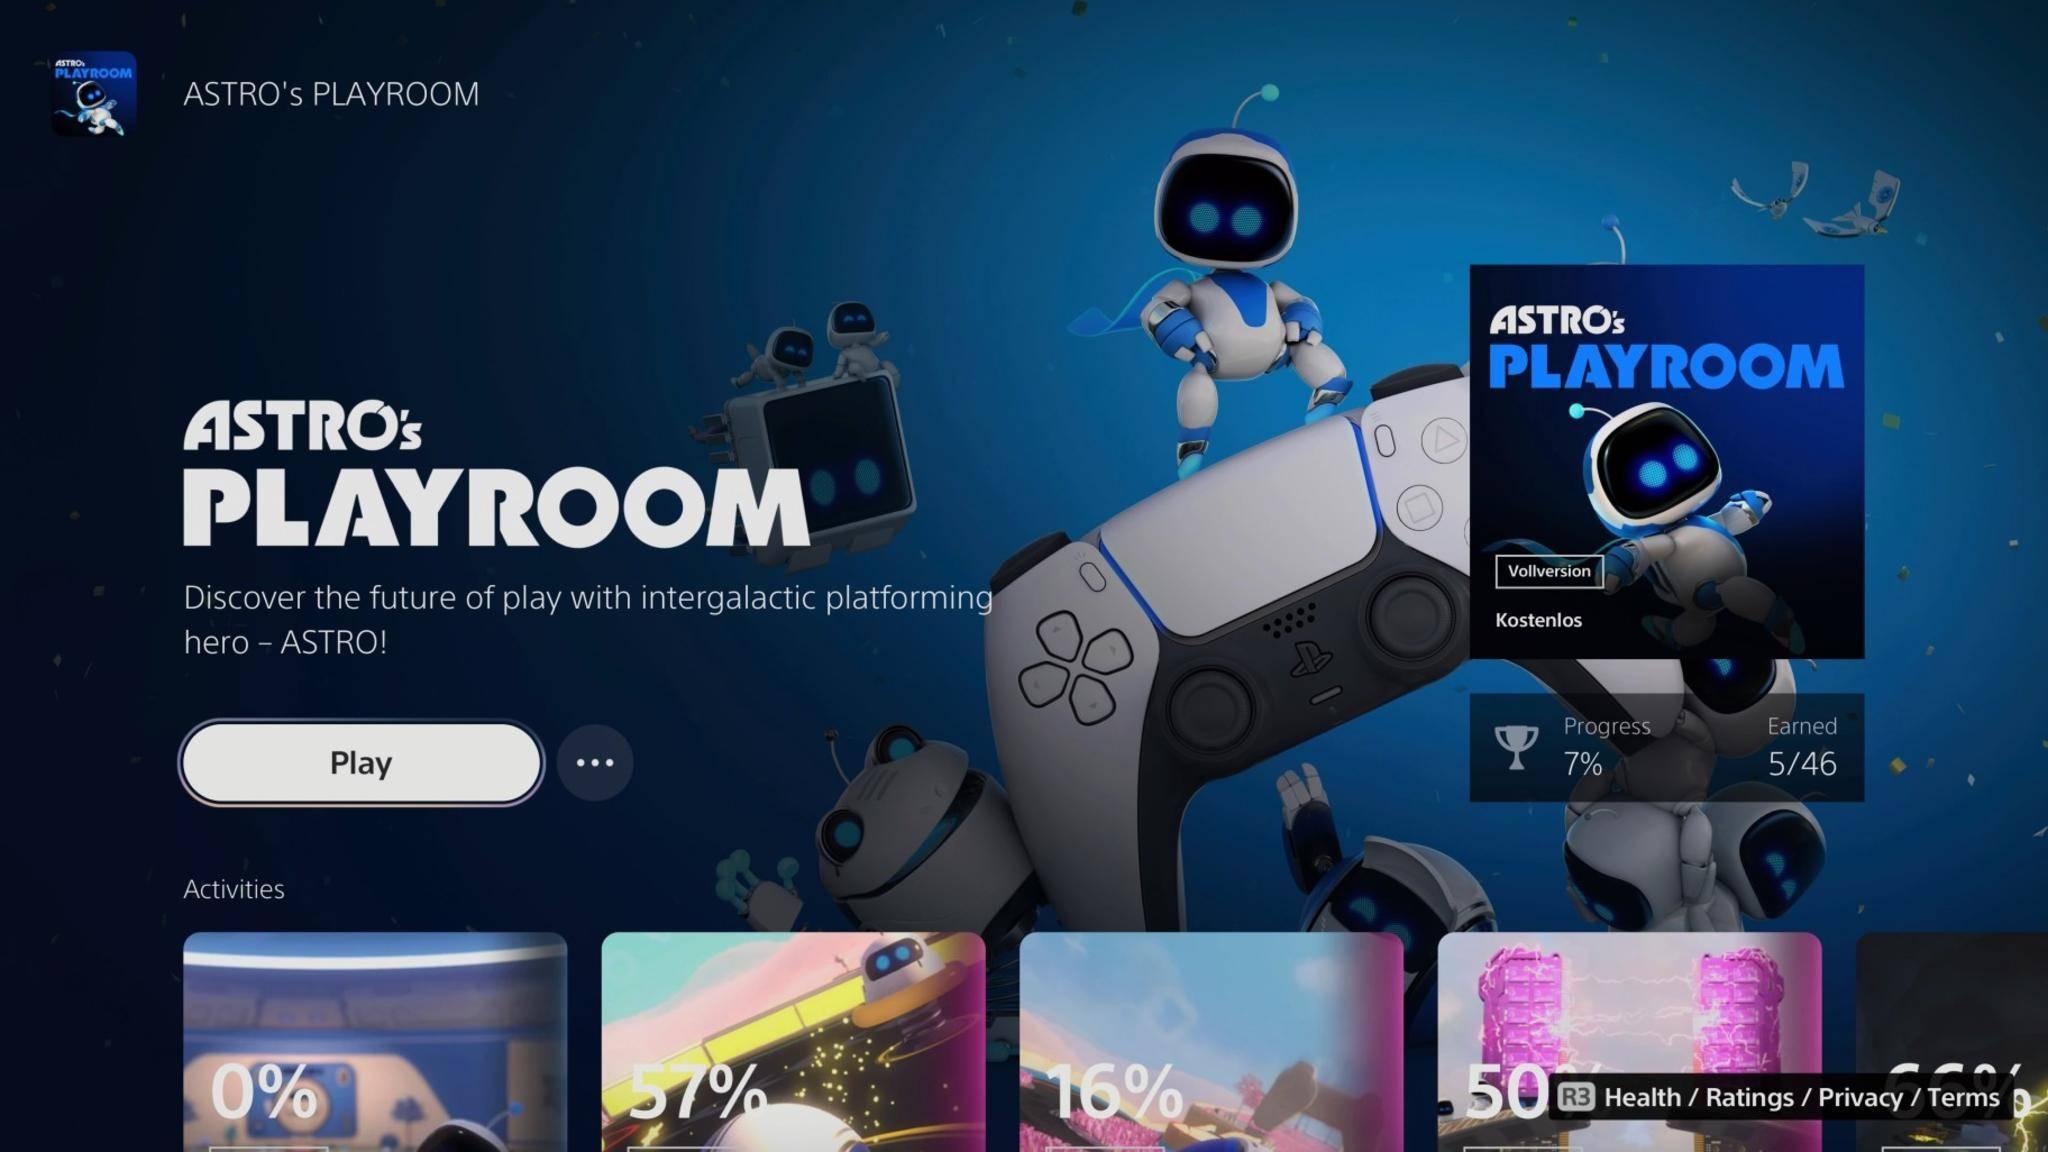 ps5-astros-playroom-game-hub